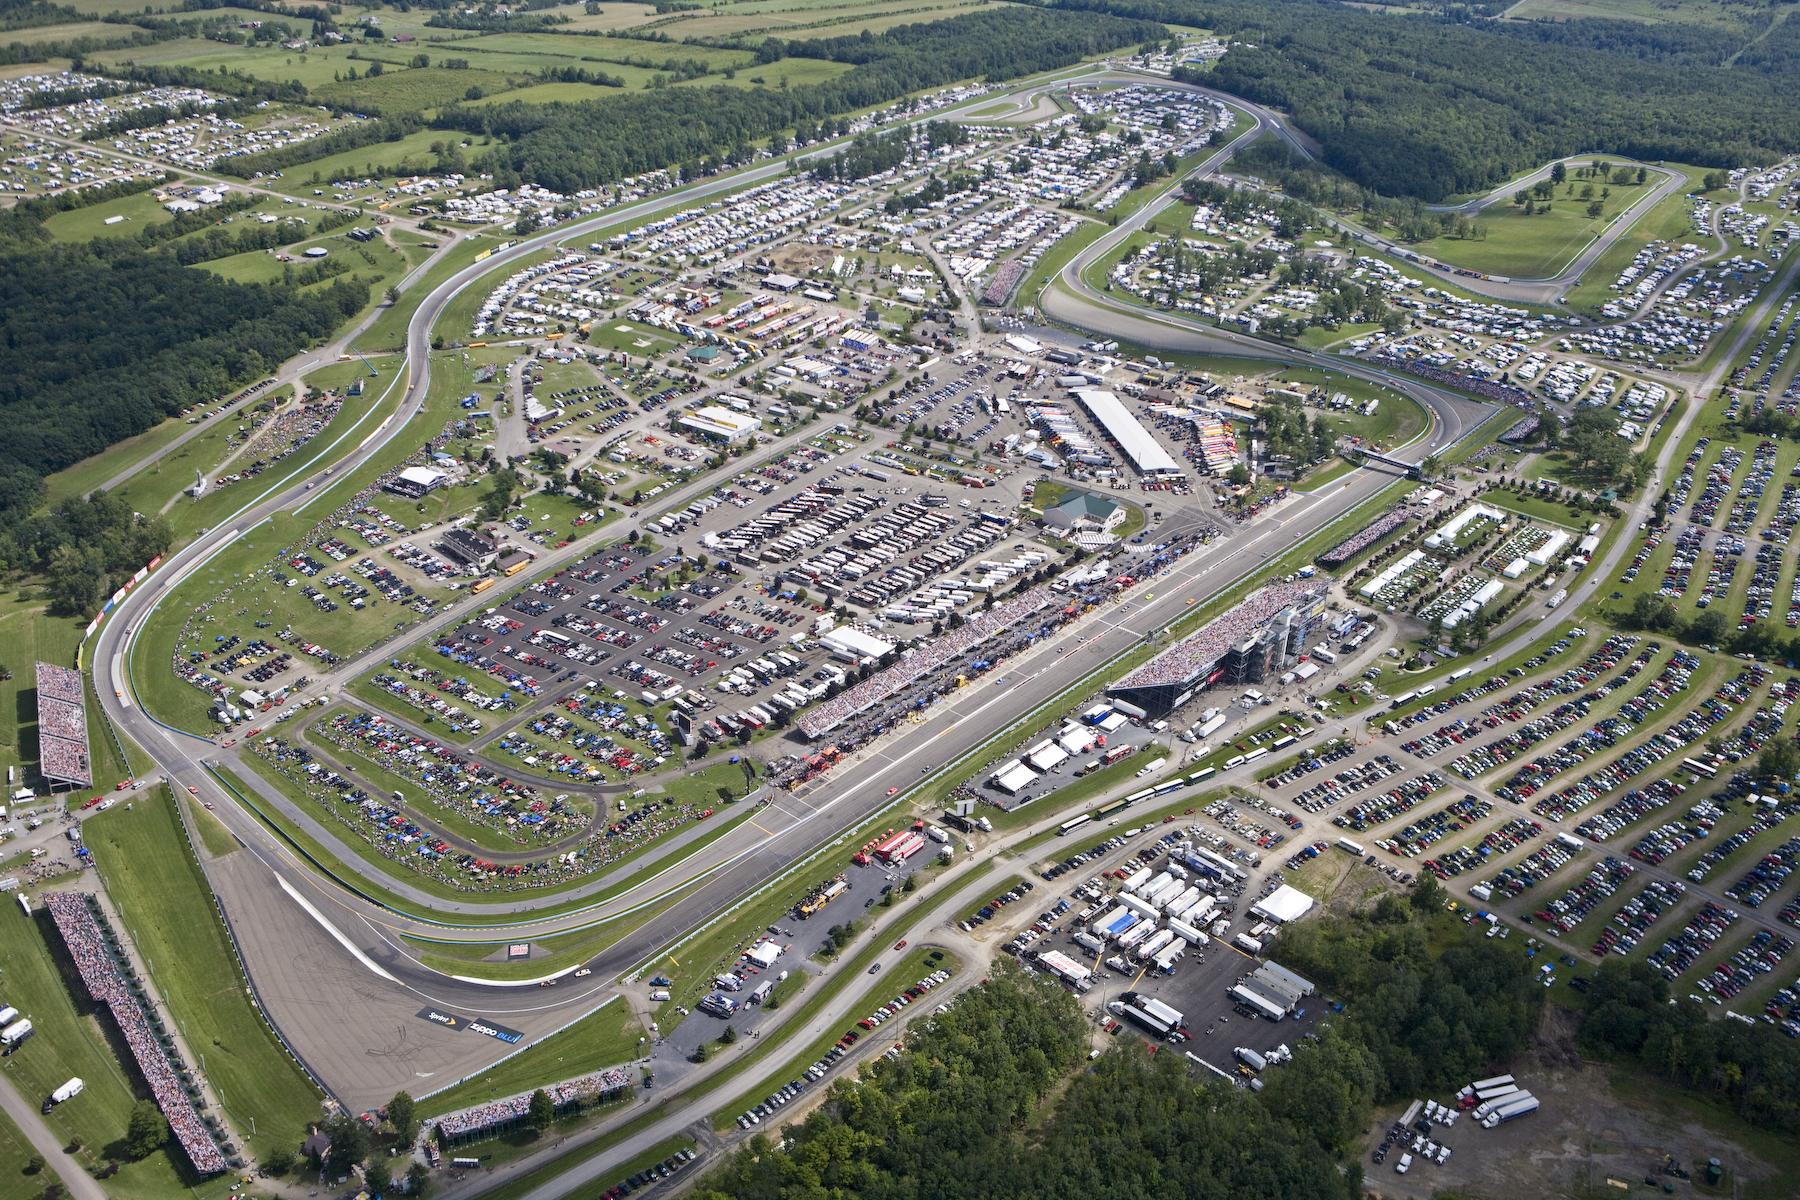 Circuito Watkins Glen : Watkins glen international photo galleries nascar